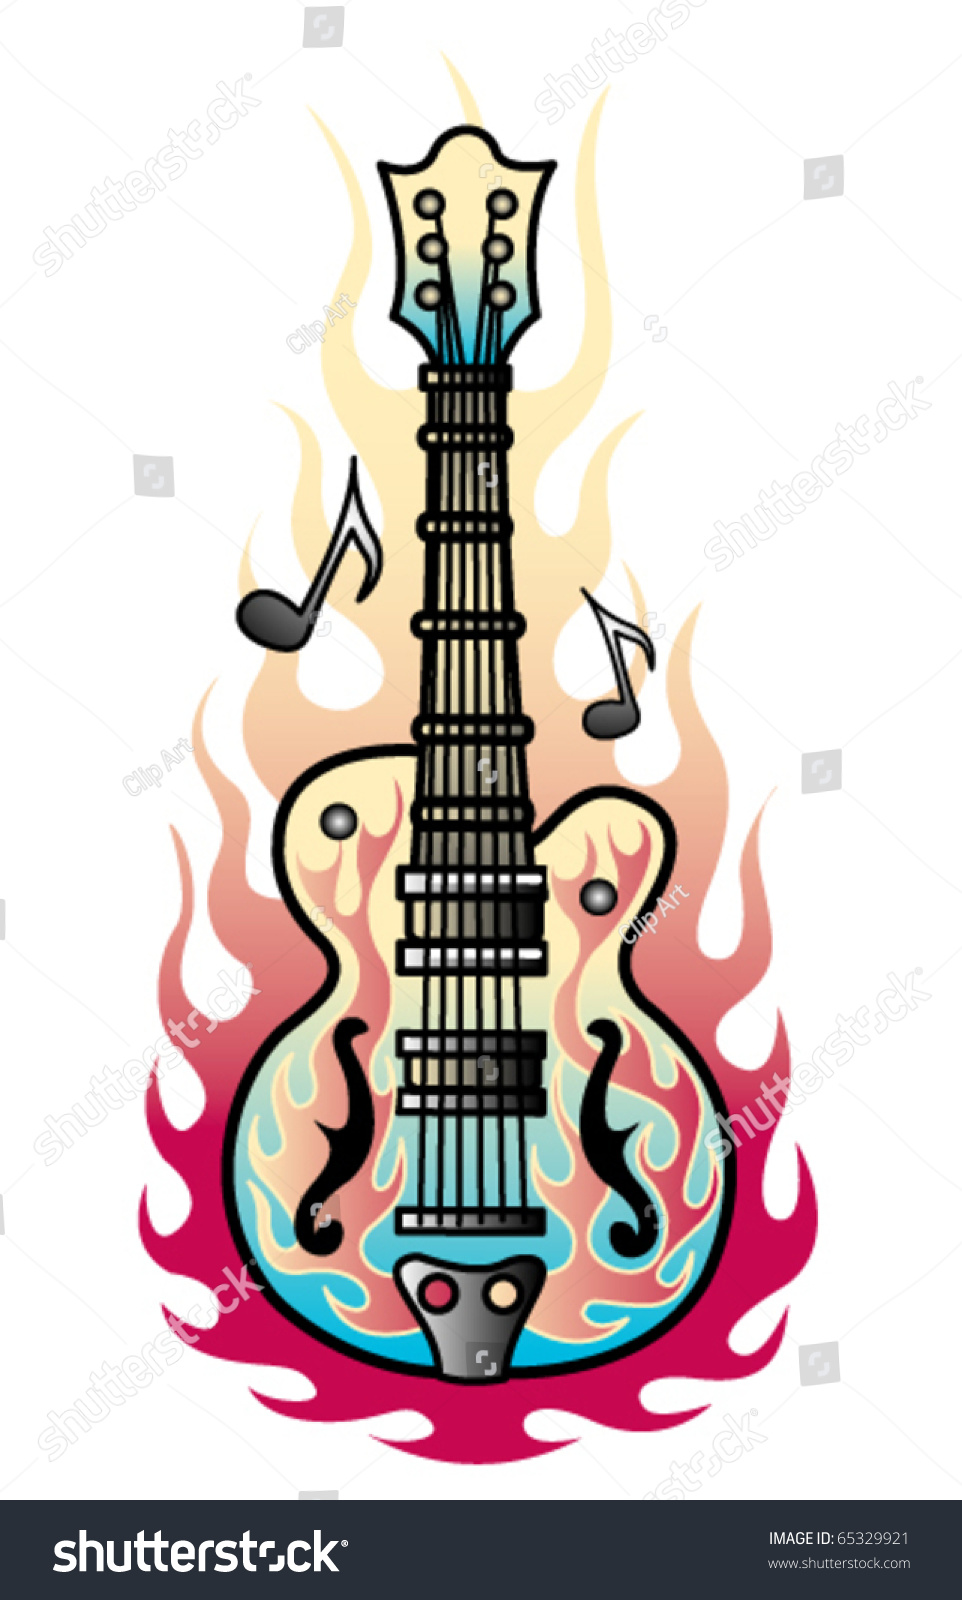 tattoo design rock roll guitar flames stock vector 65329921 shutterstock. Black Bedroom Furniture Sets. Home Design Ideas